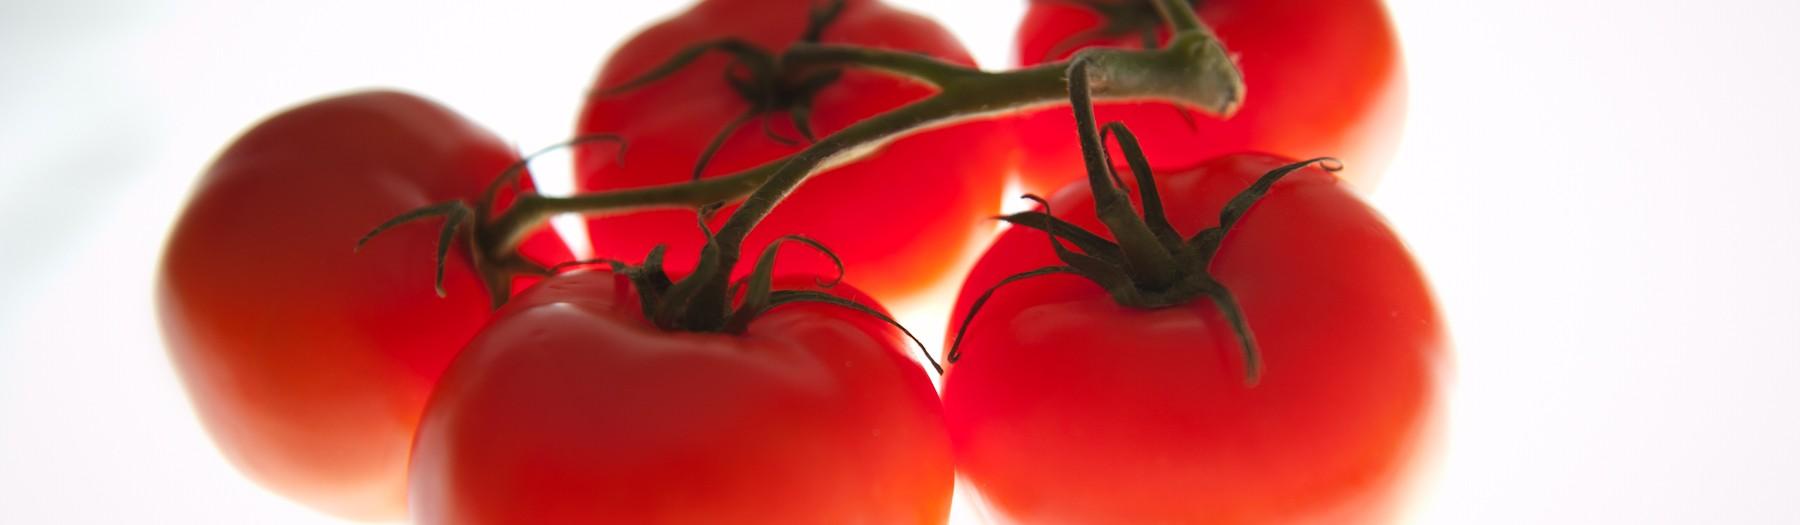 Still life of a tomato...